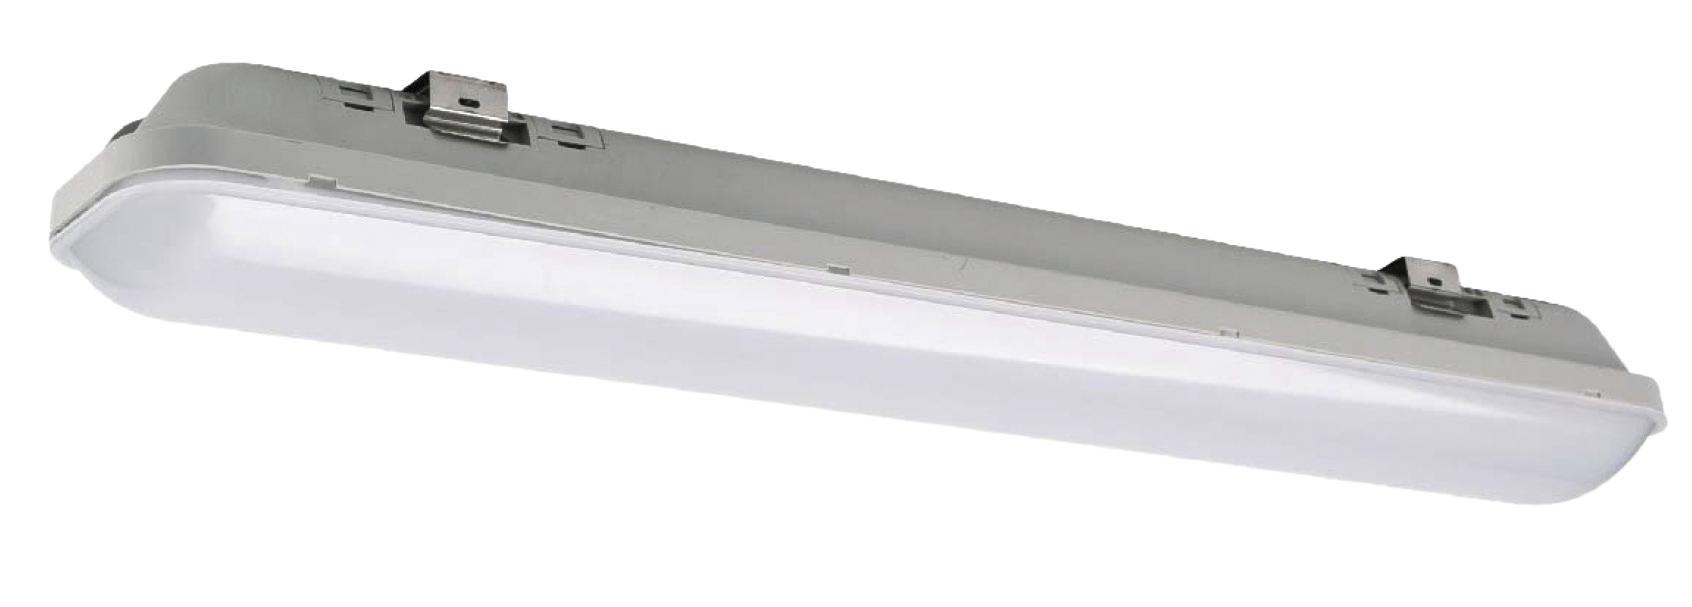 Equipo Estanco LED Hermético Policarbonato